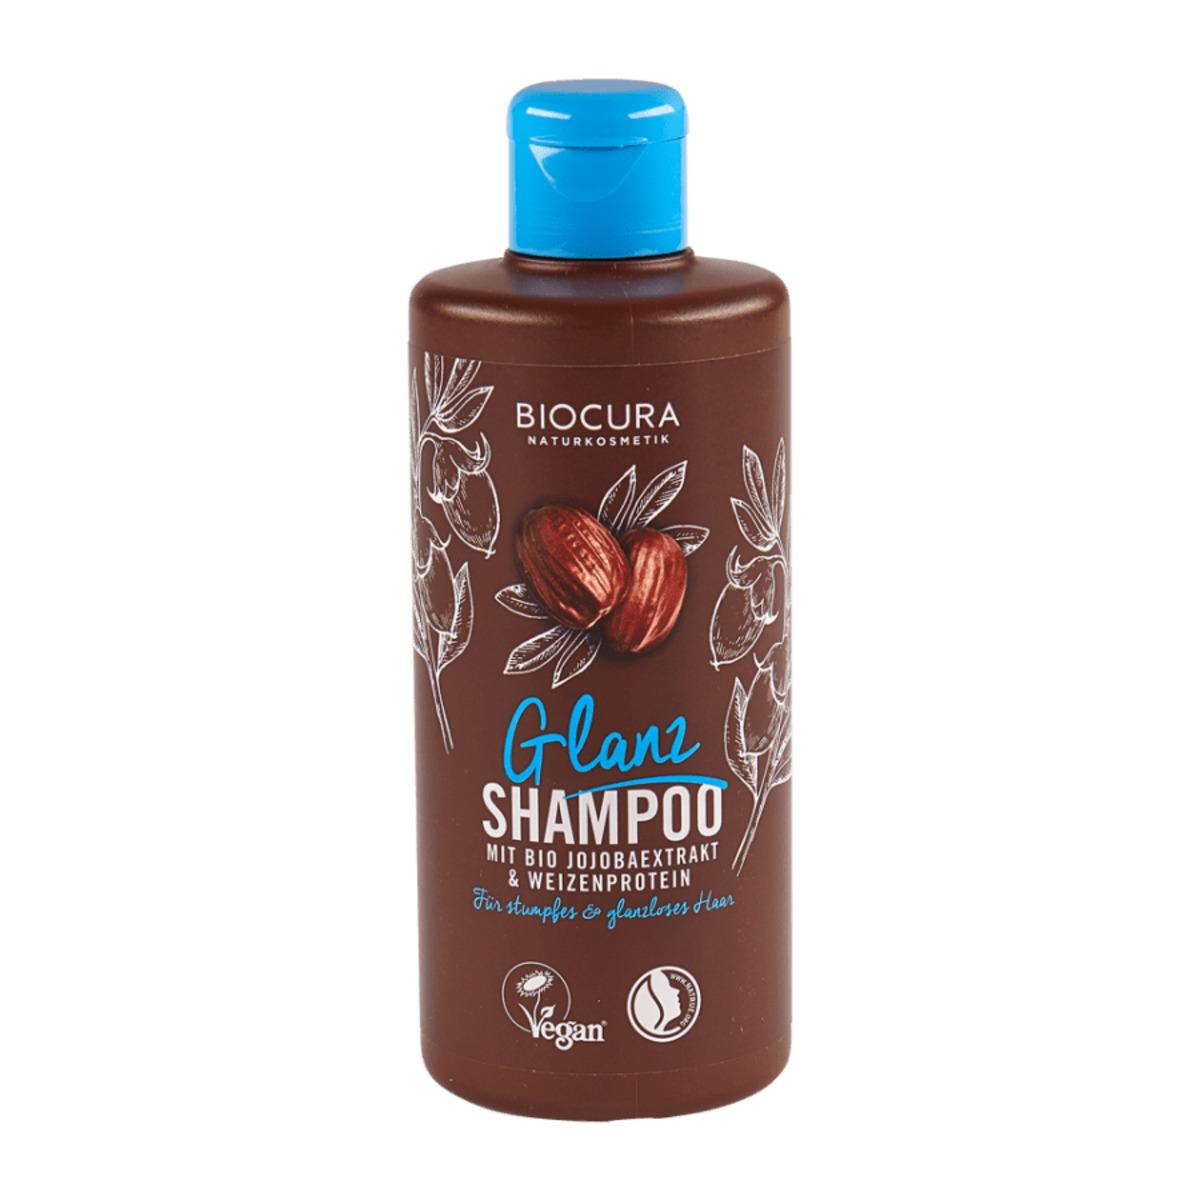 Bild 2 von BIOCURA     Shampoo